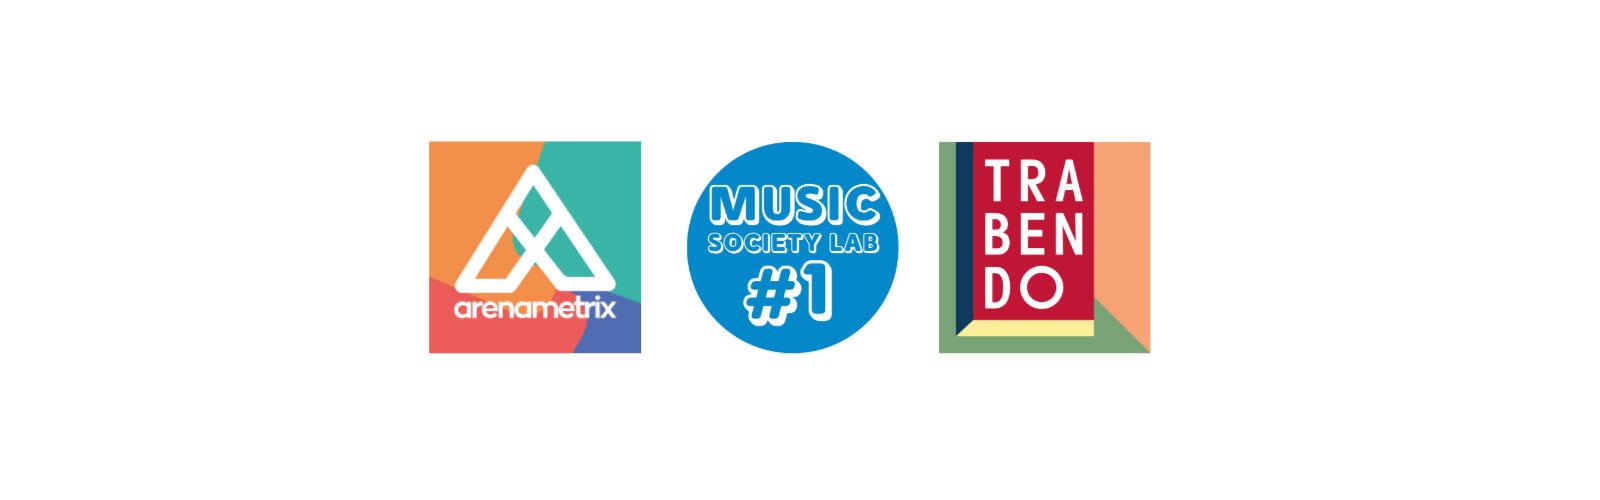 music-society-lab-1